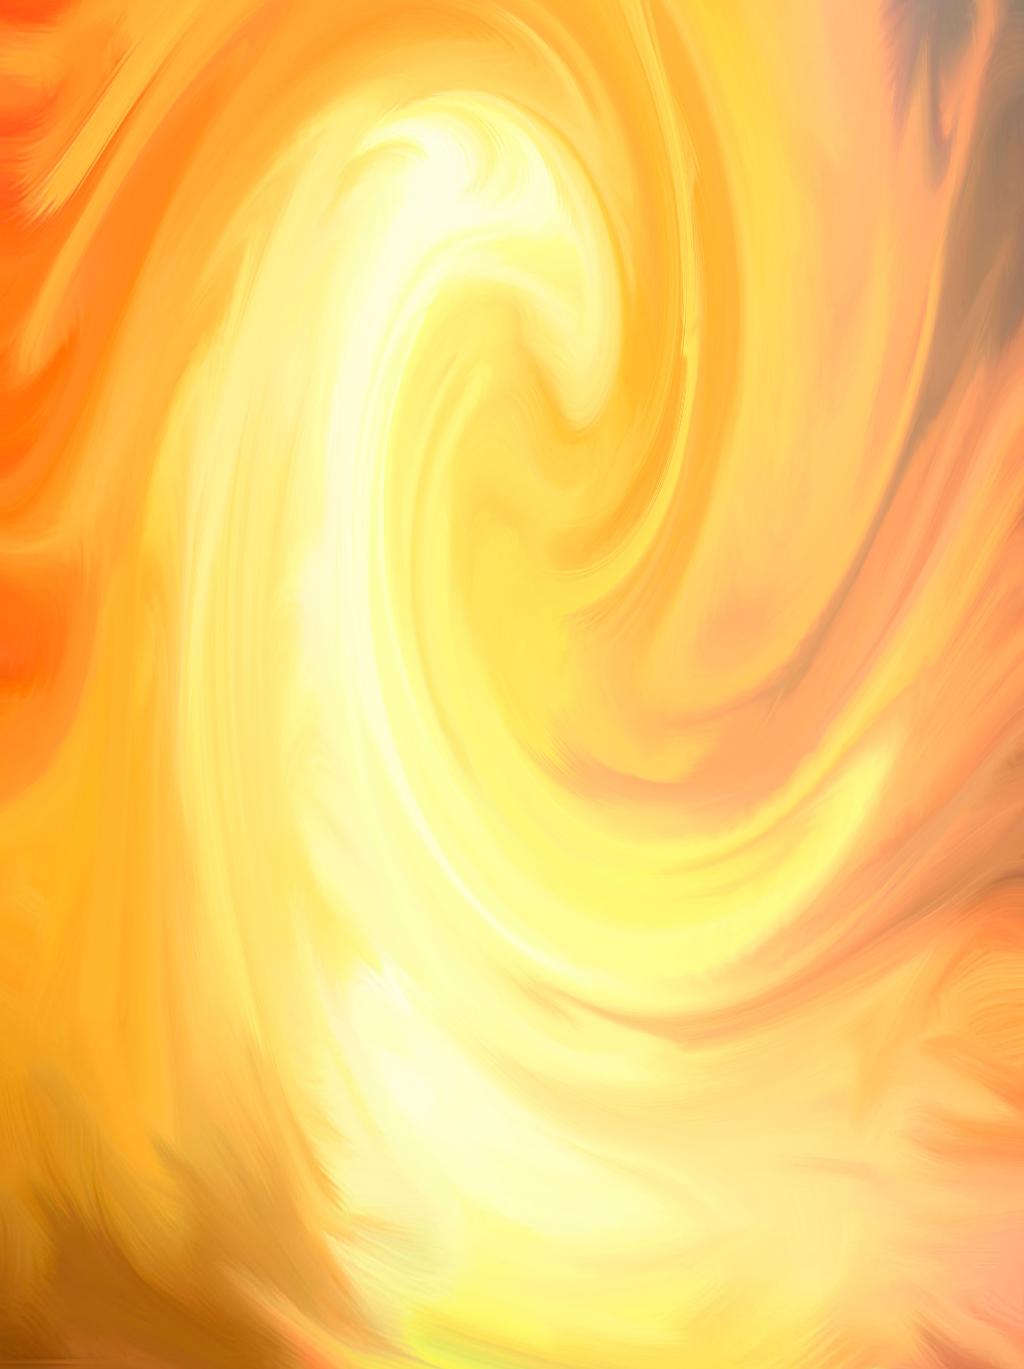 affiche mat u00e9rielle de fond soleil spirale mode jaune dor jaune dor la mode spirale image de fond